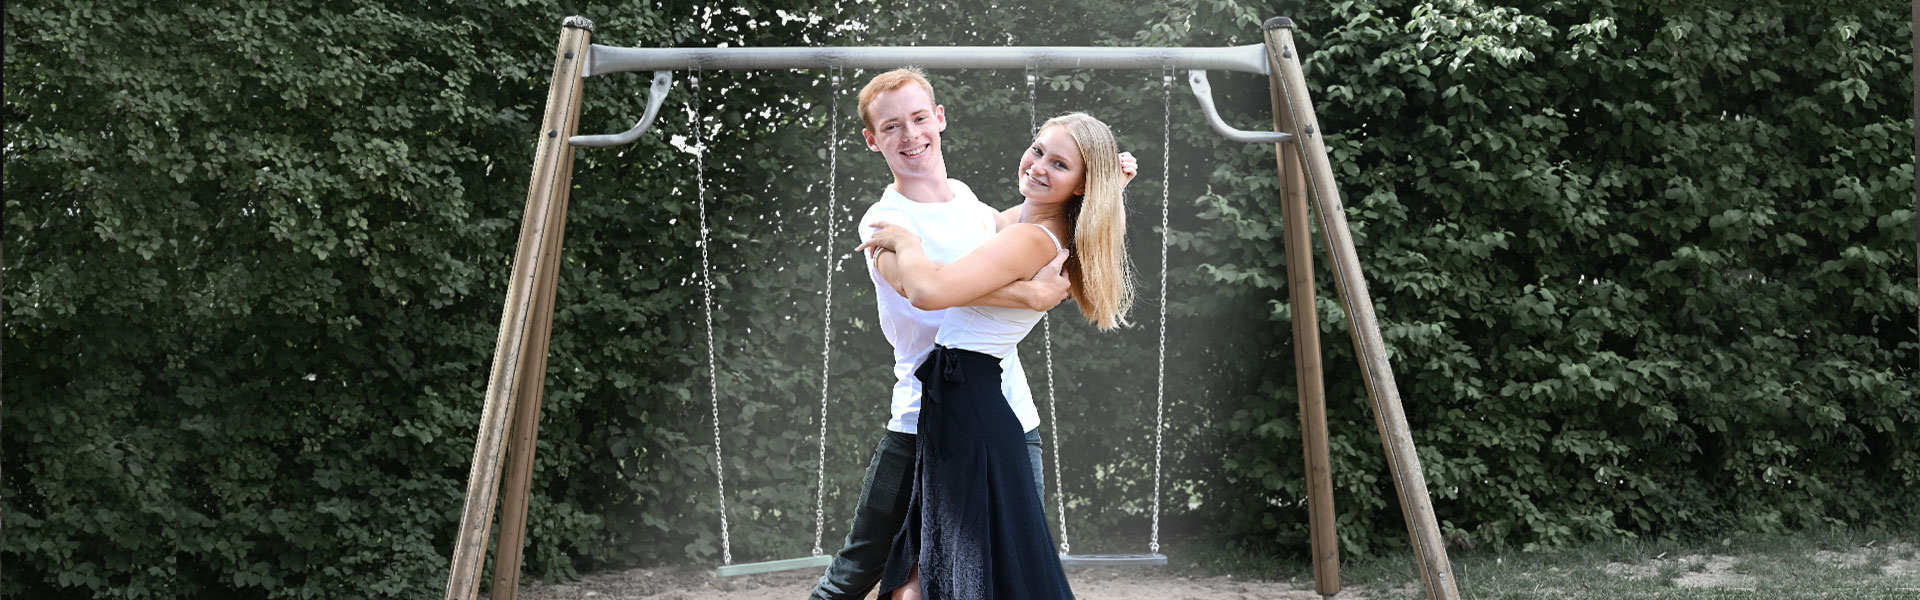 Kontakt zur Tanzschule Springer